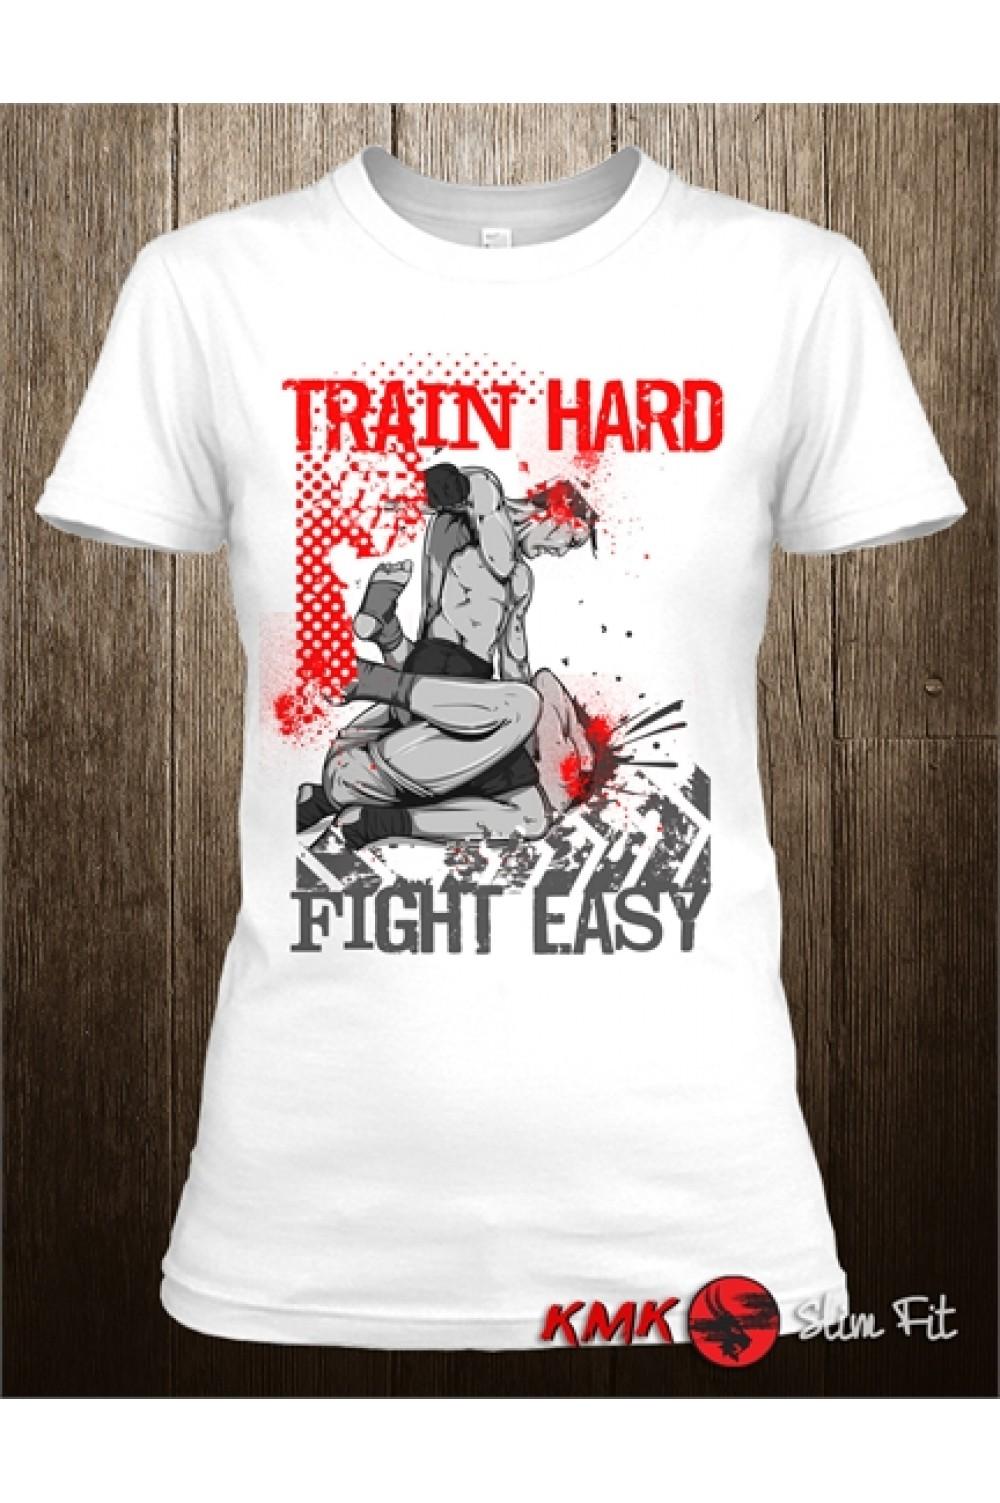 37c4747aaac7b Train Hard Printed T shirt | Sport Tee | Fitness T-shirt | Long and Short  ...